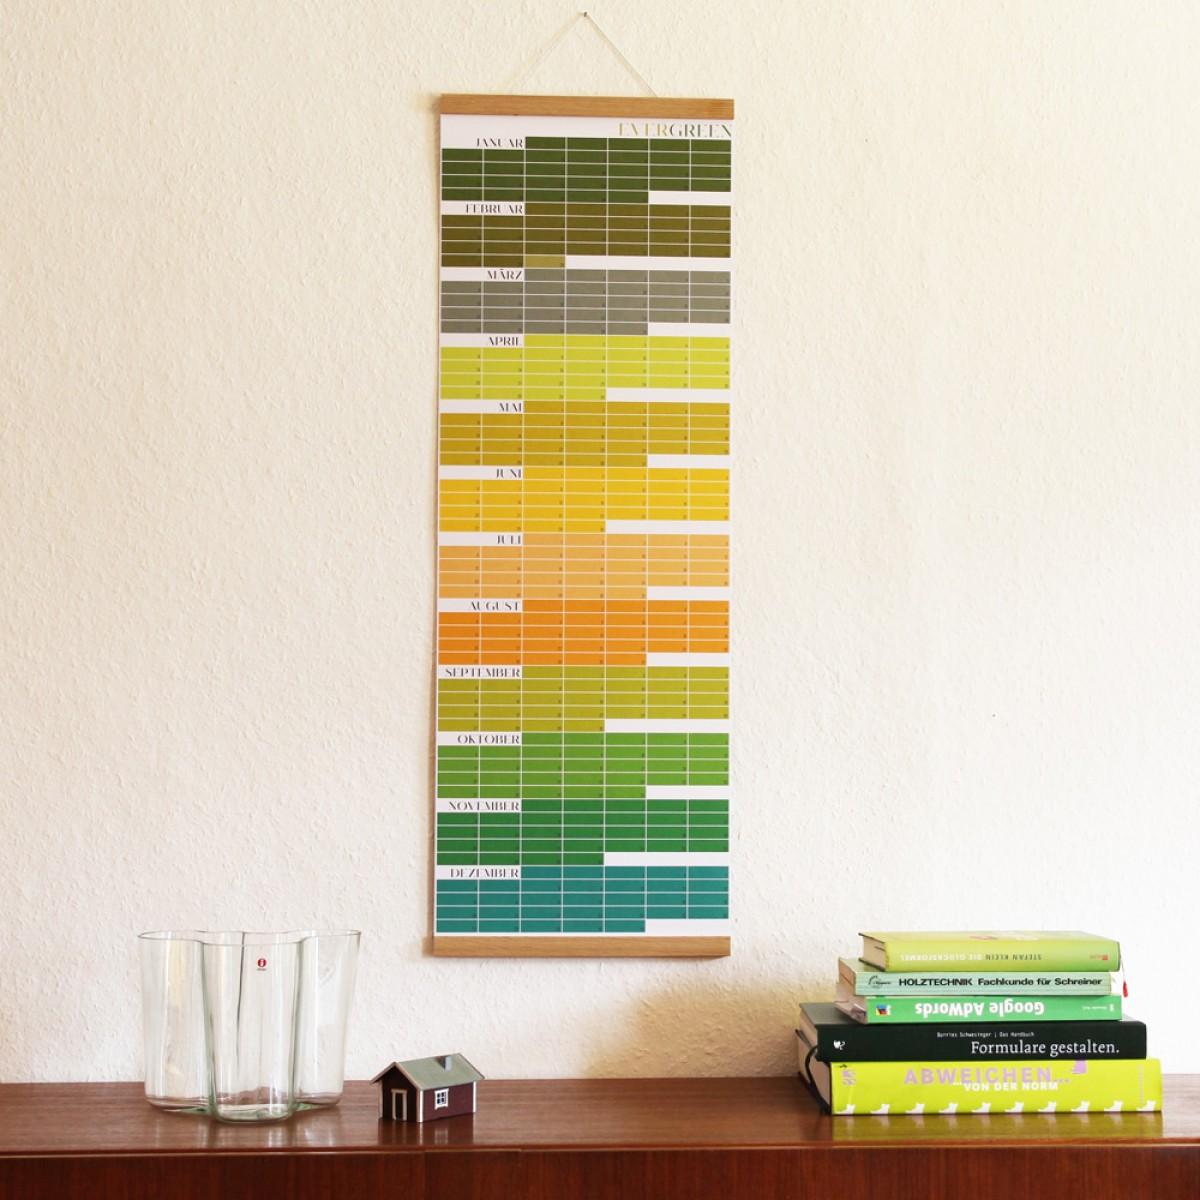 EVERGREEN – Immerwährender Kalender | Geburtstagskalender | Ewiger Kalender | Wandkalender